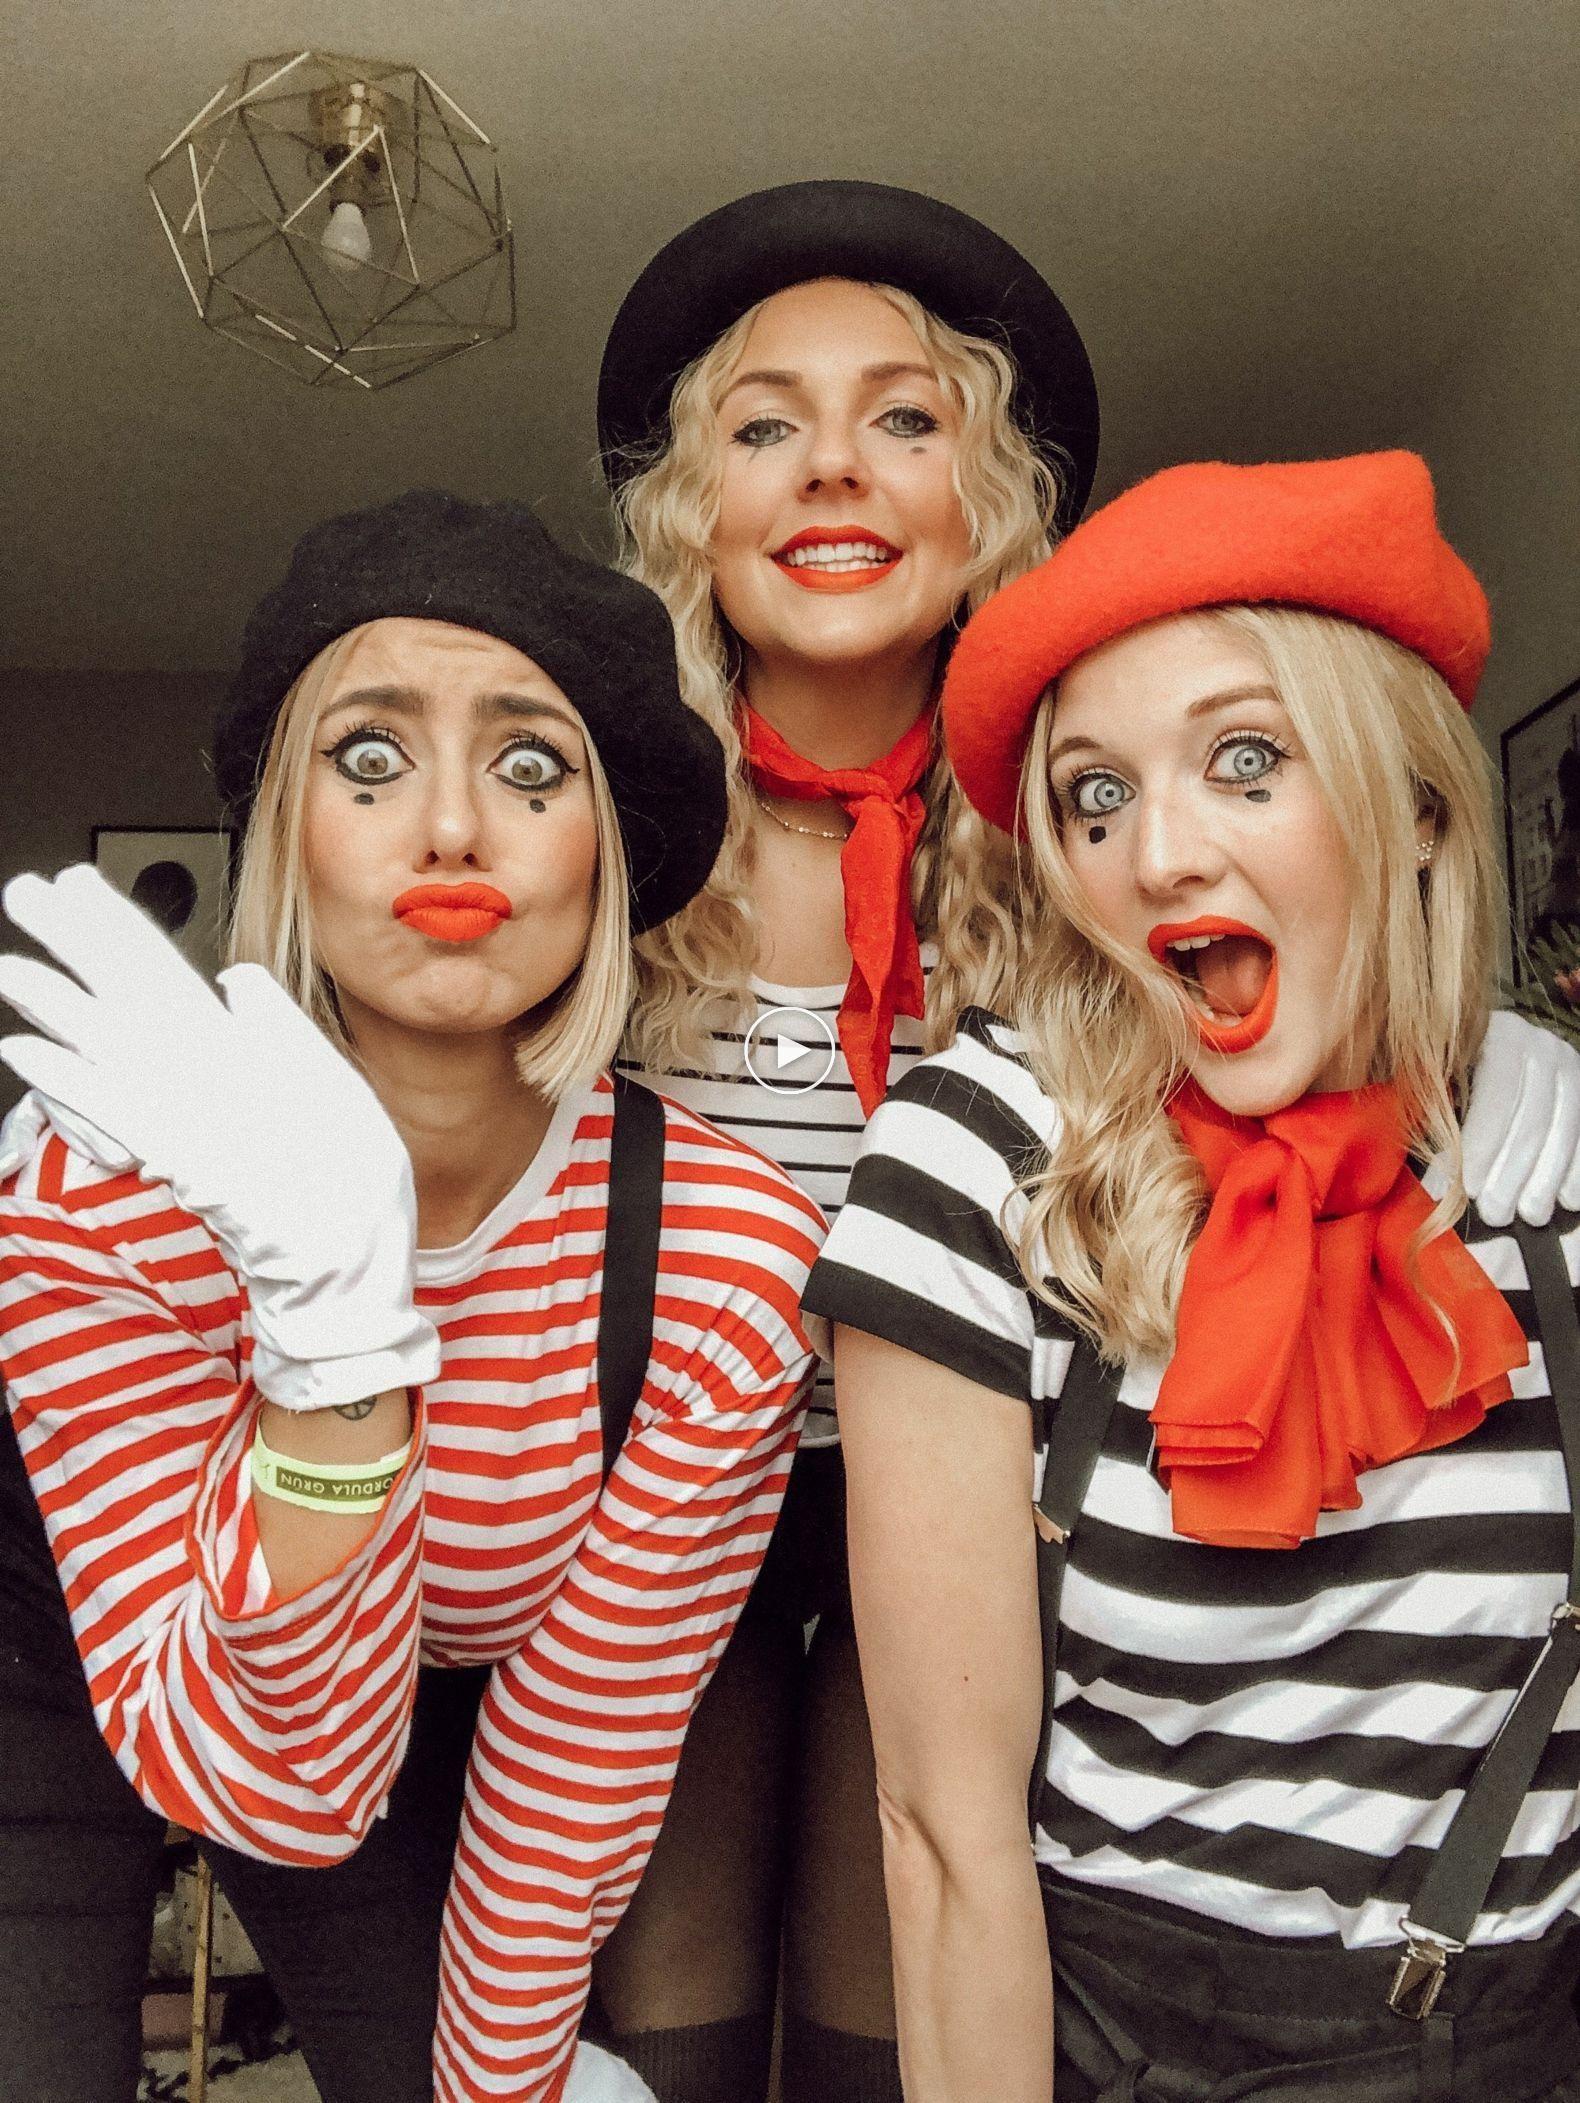 Disfraces Para Halloween 2020 Mujer Pinterest Tendencias de Halloween en Pinterest: disfraces, maquillaje y